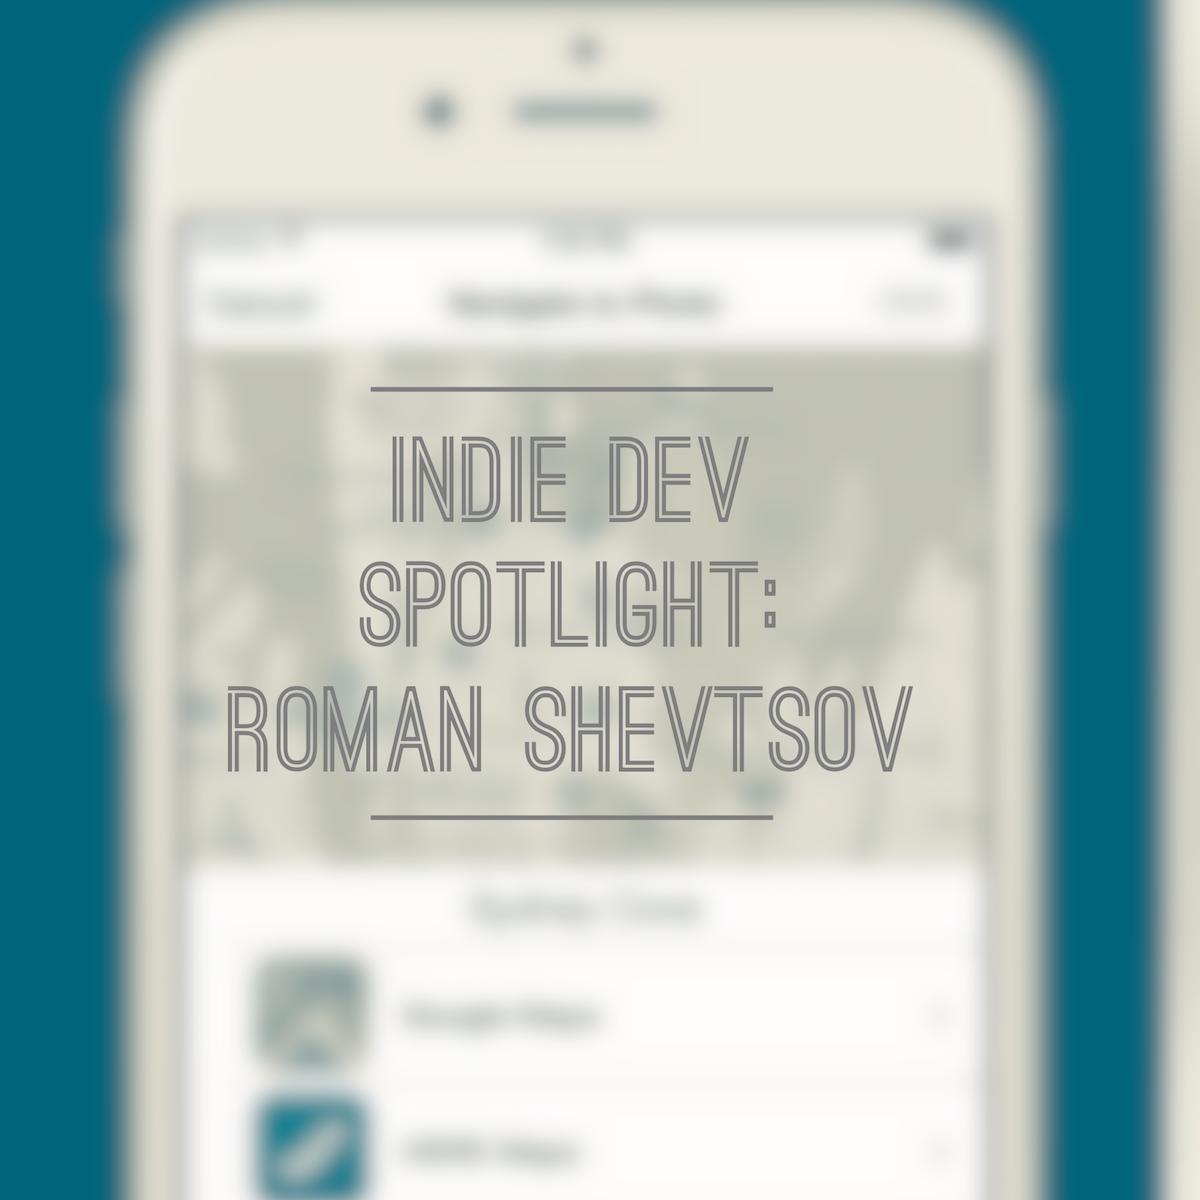 Indie Dev Spotlight: Roman Shevtsov